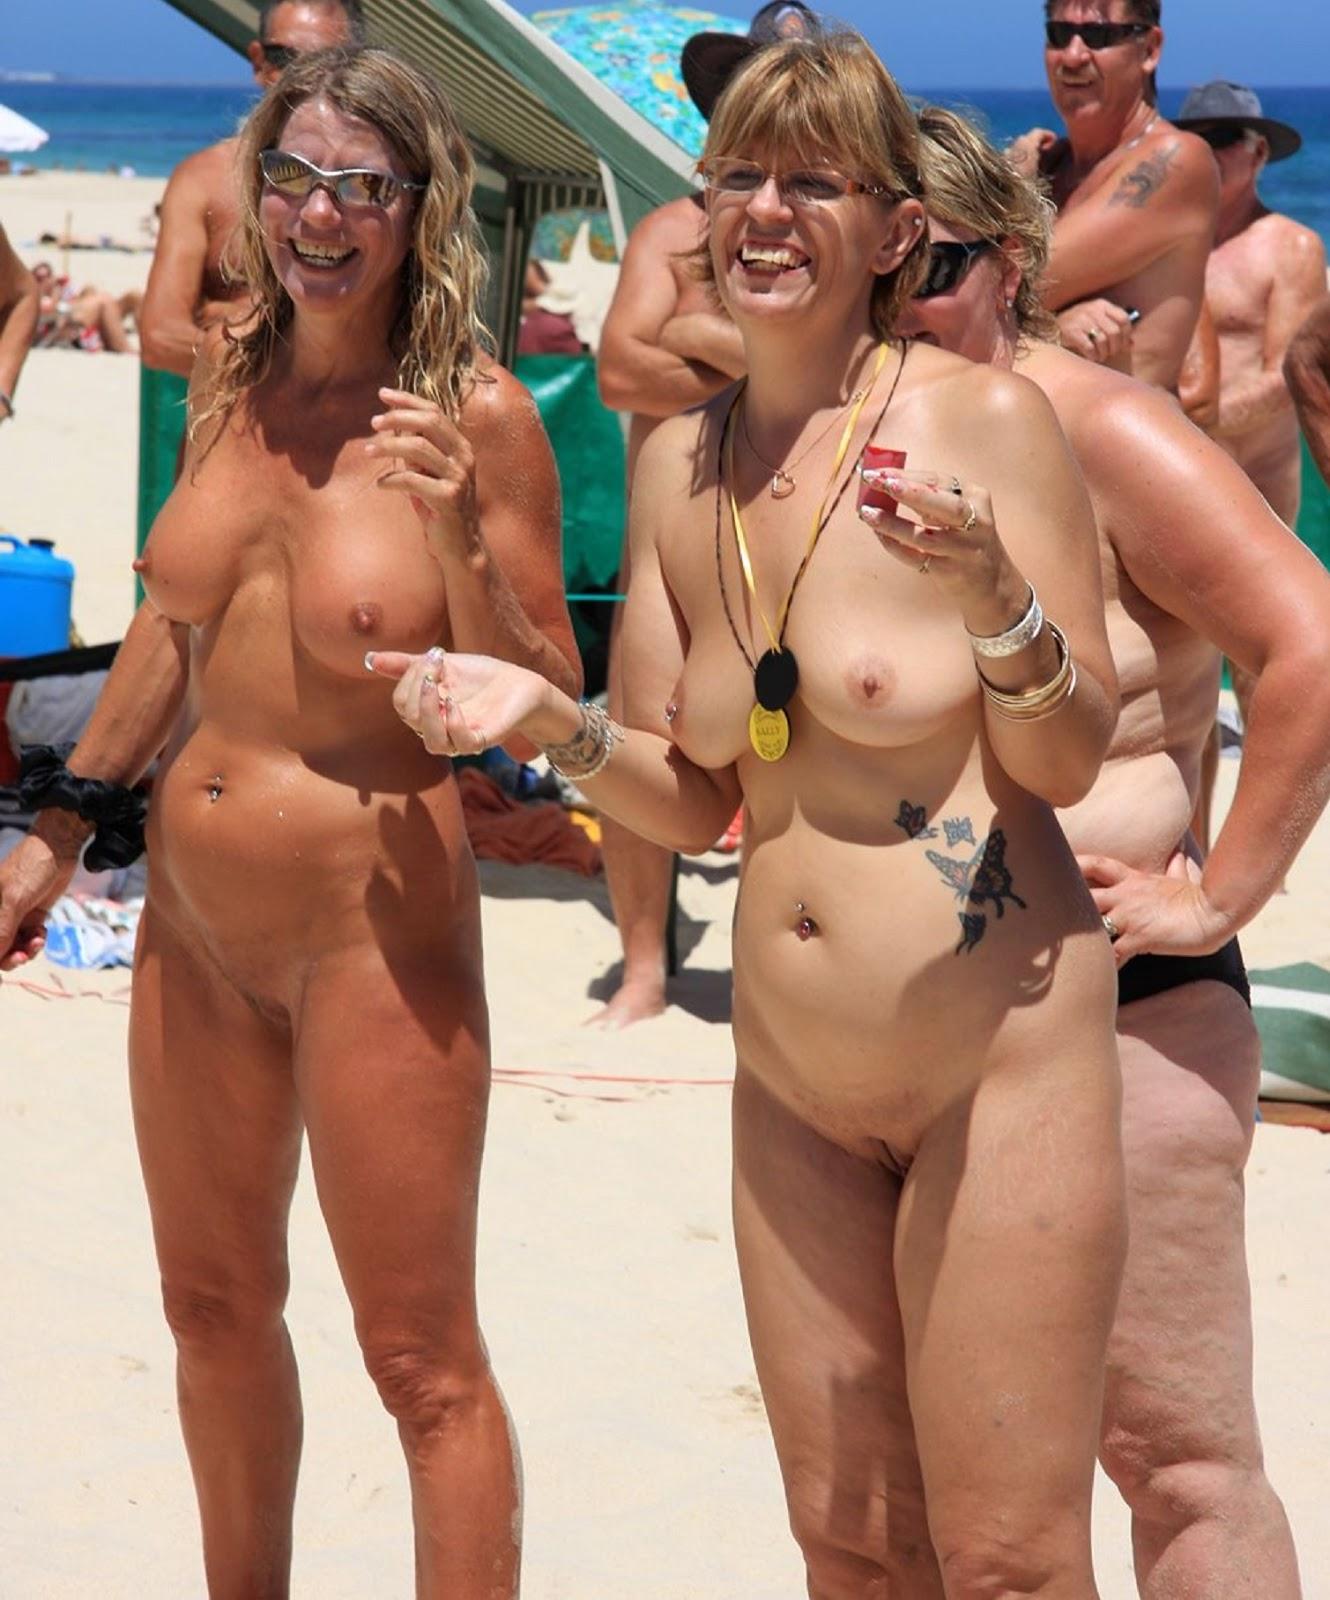 Public Nudity Project Nude Beach Olympics 2009 -5352